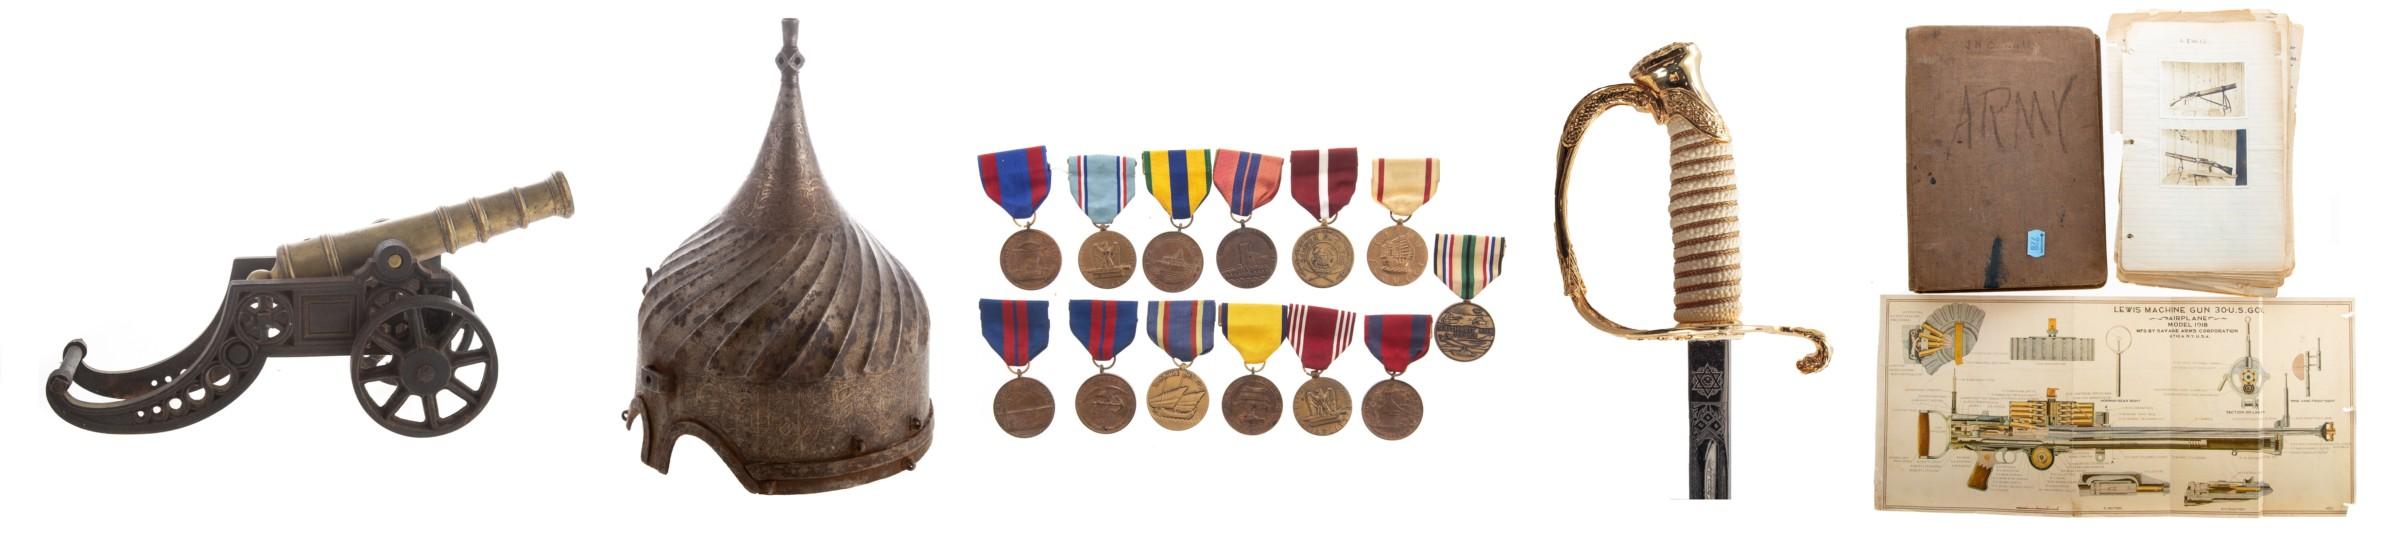 Militaria, Americana & Scientific Instrument Highlights